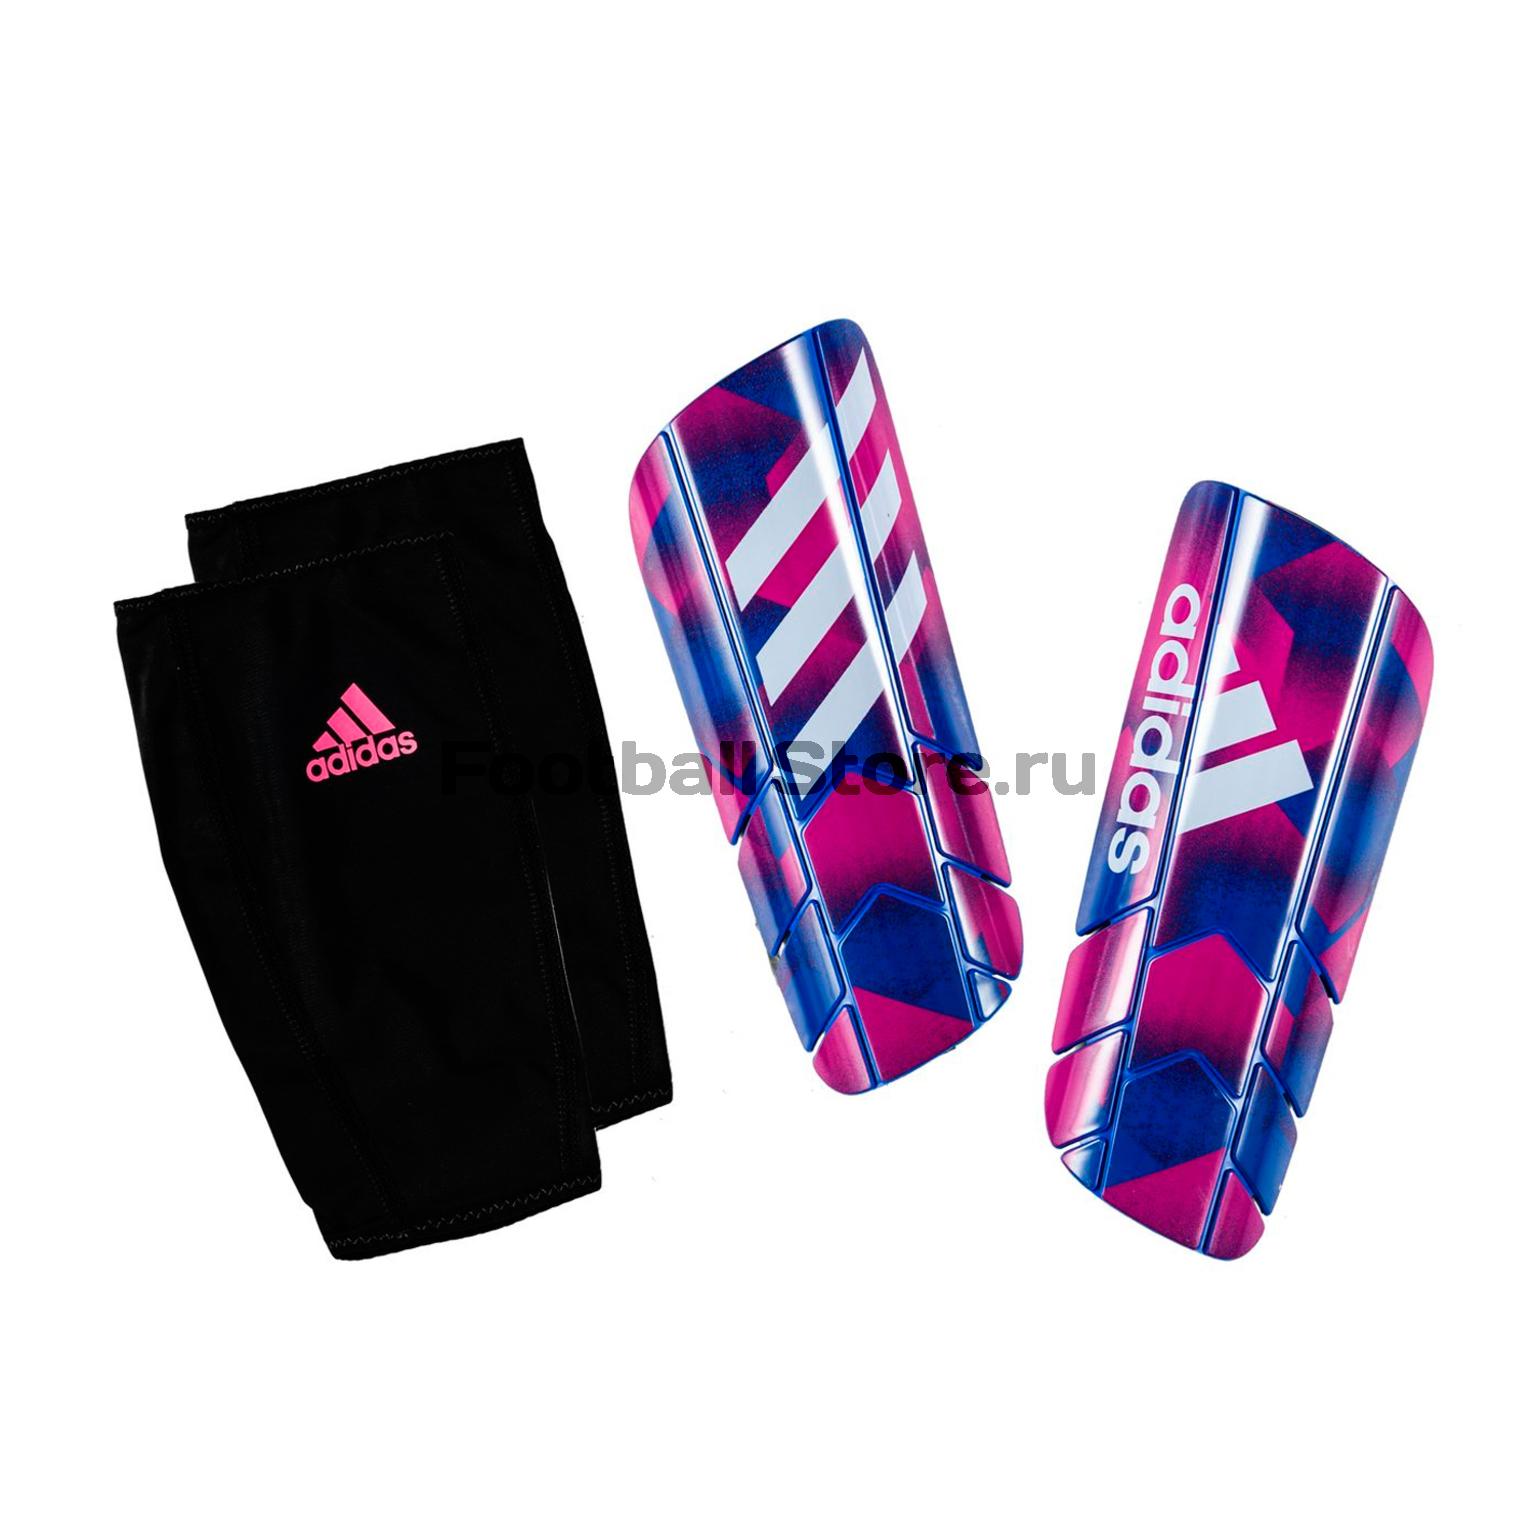 все цены на Защита ног Adidas Щитки Adidas Ghost Graph AZ9865 онлайн